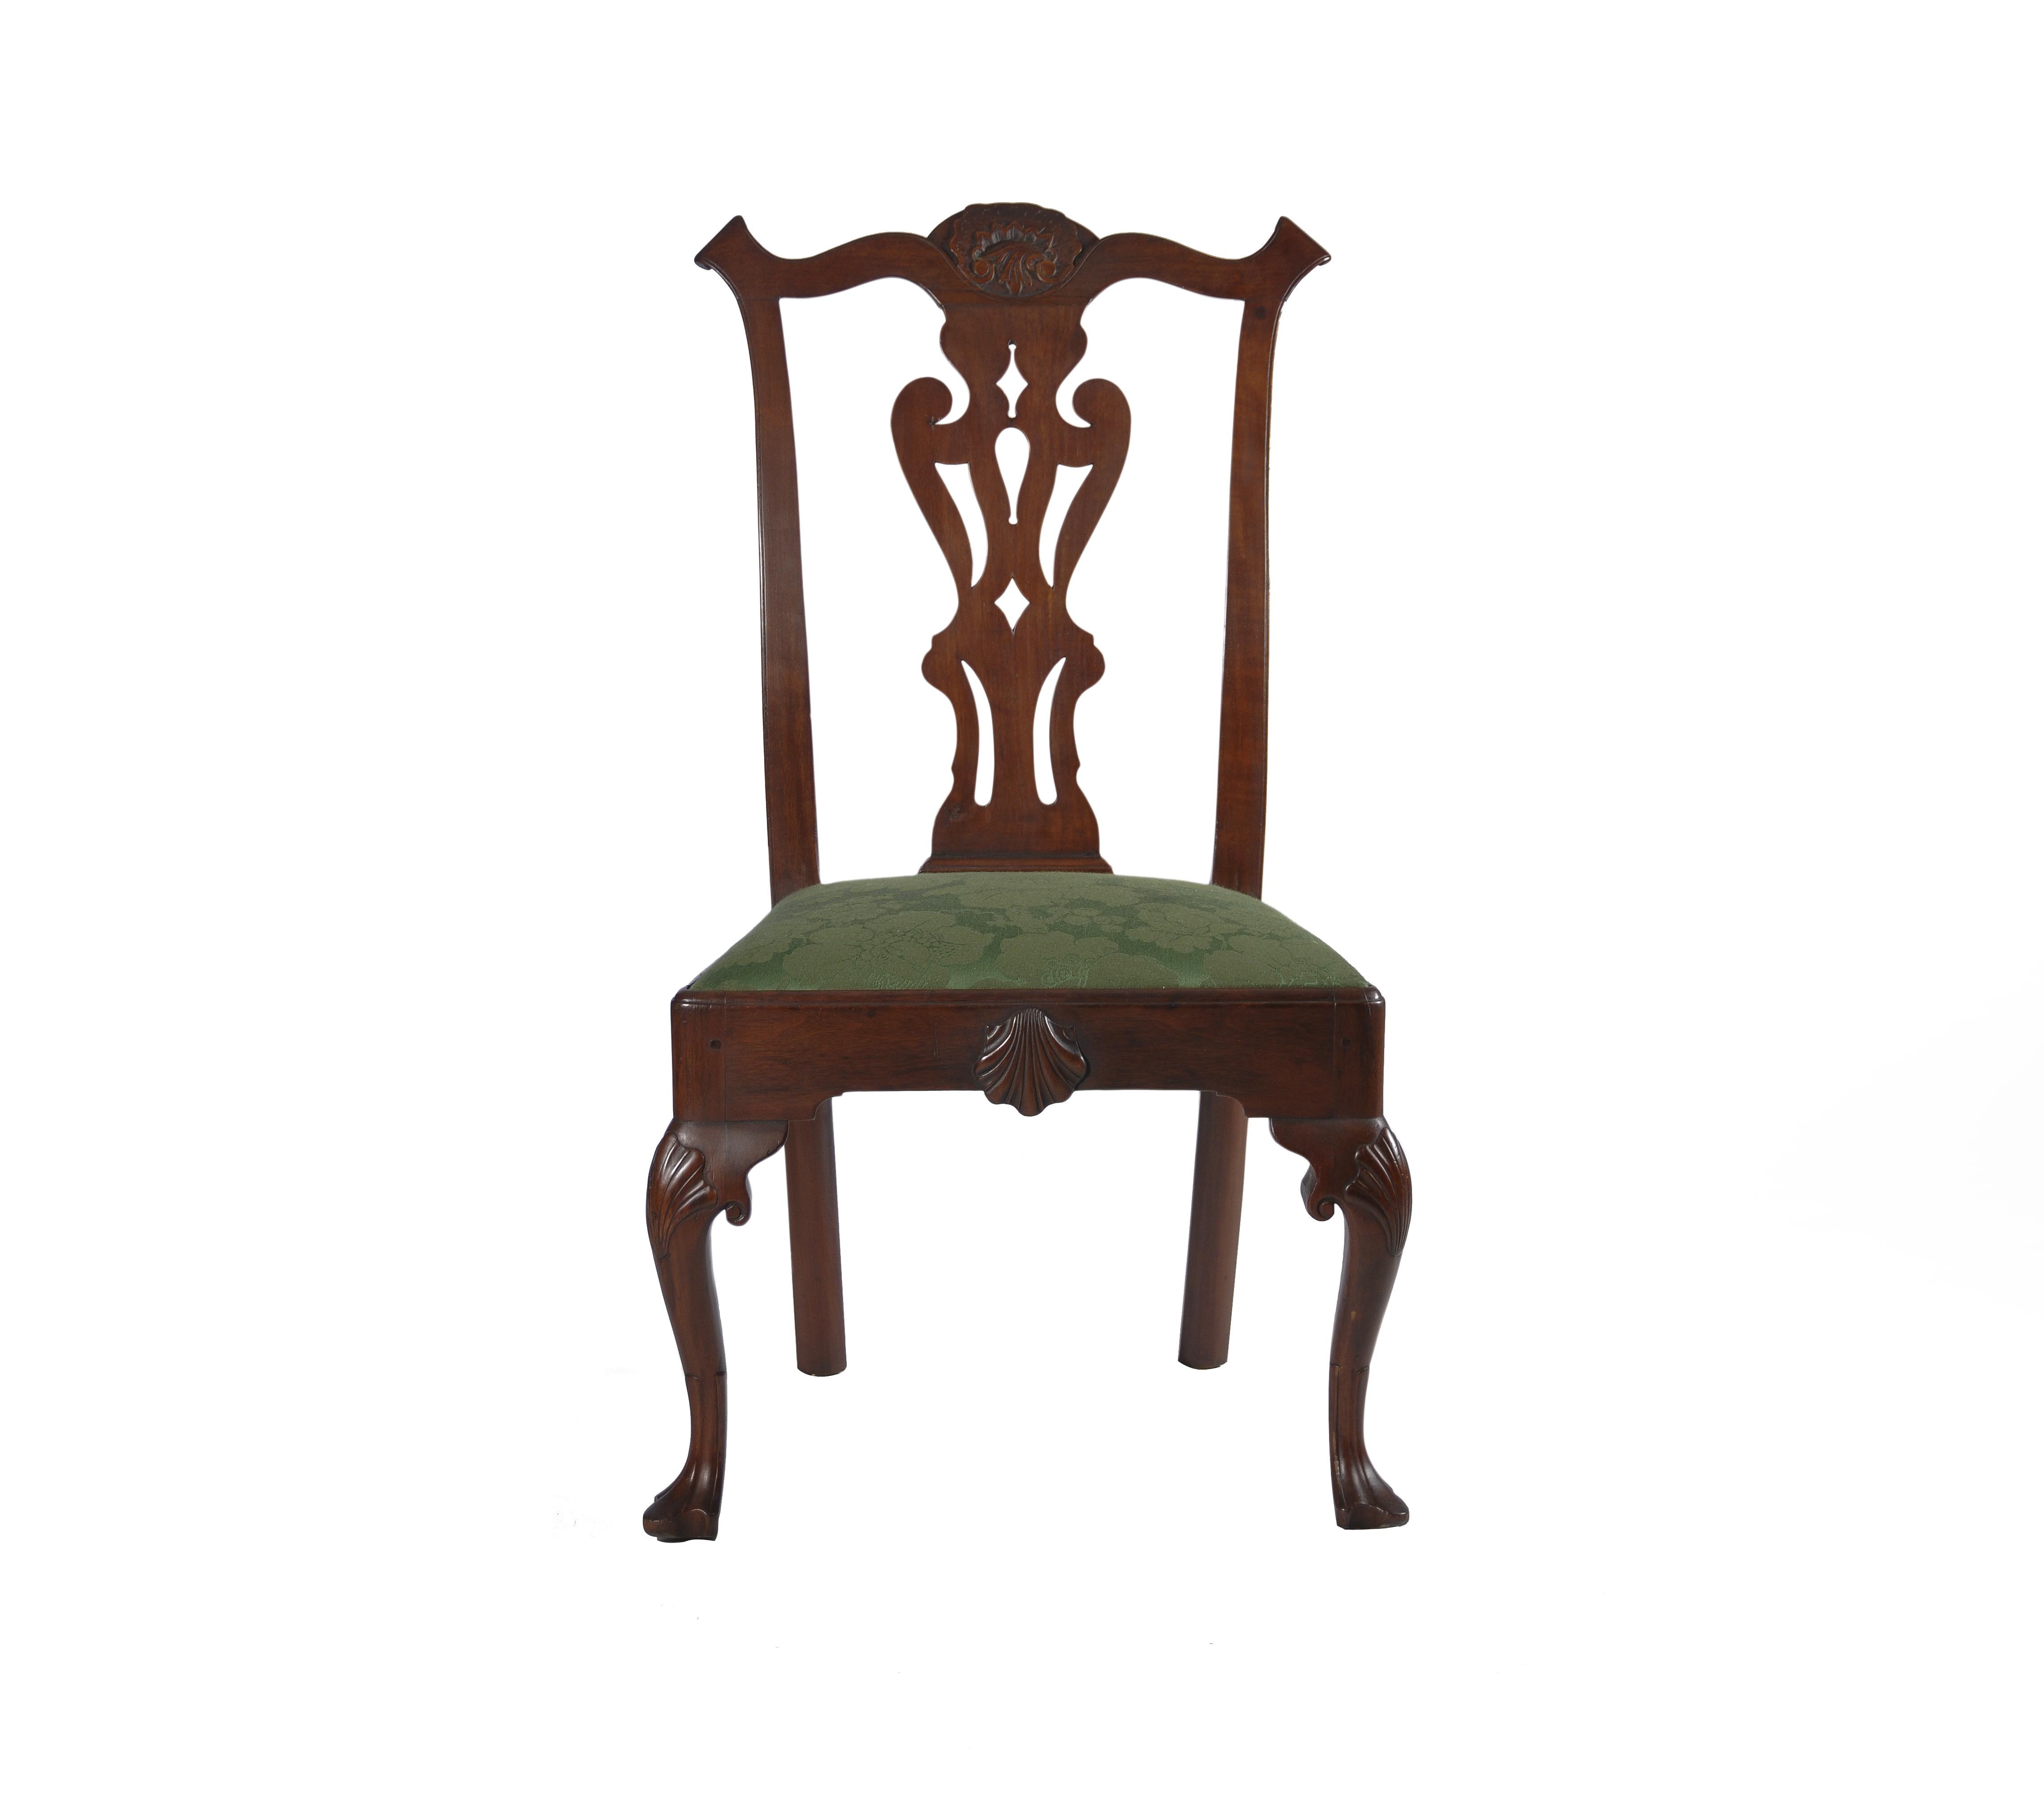 Queen Anne Chair Covers Part 207 Fresh 10 Queen Anne  : 0613chairfront02white from www.theridgewayinn.com size 4560 x 4032 jpeg 2619kB